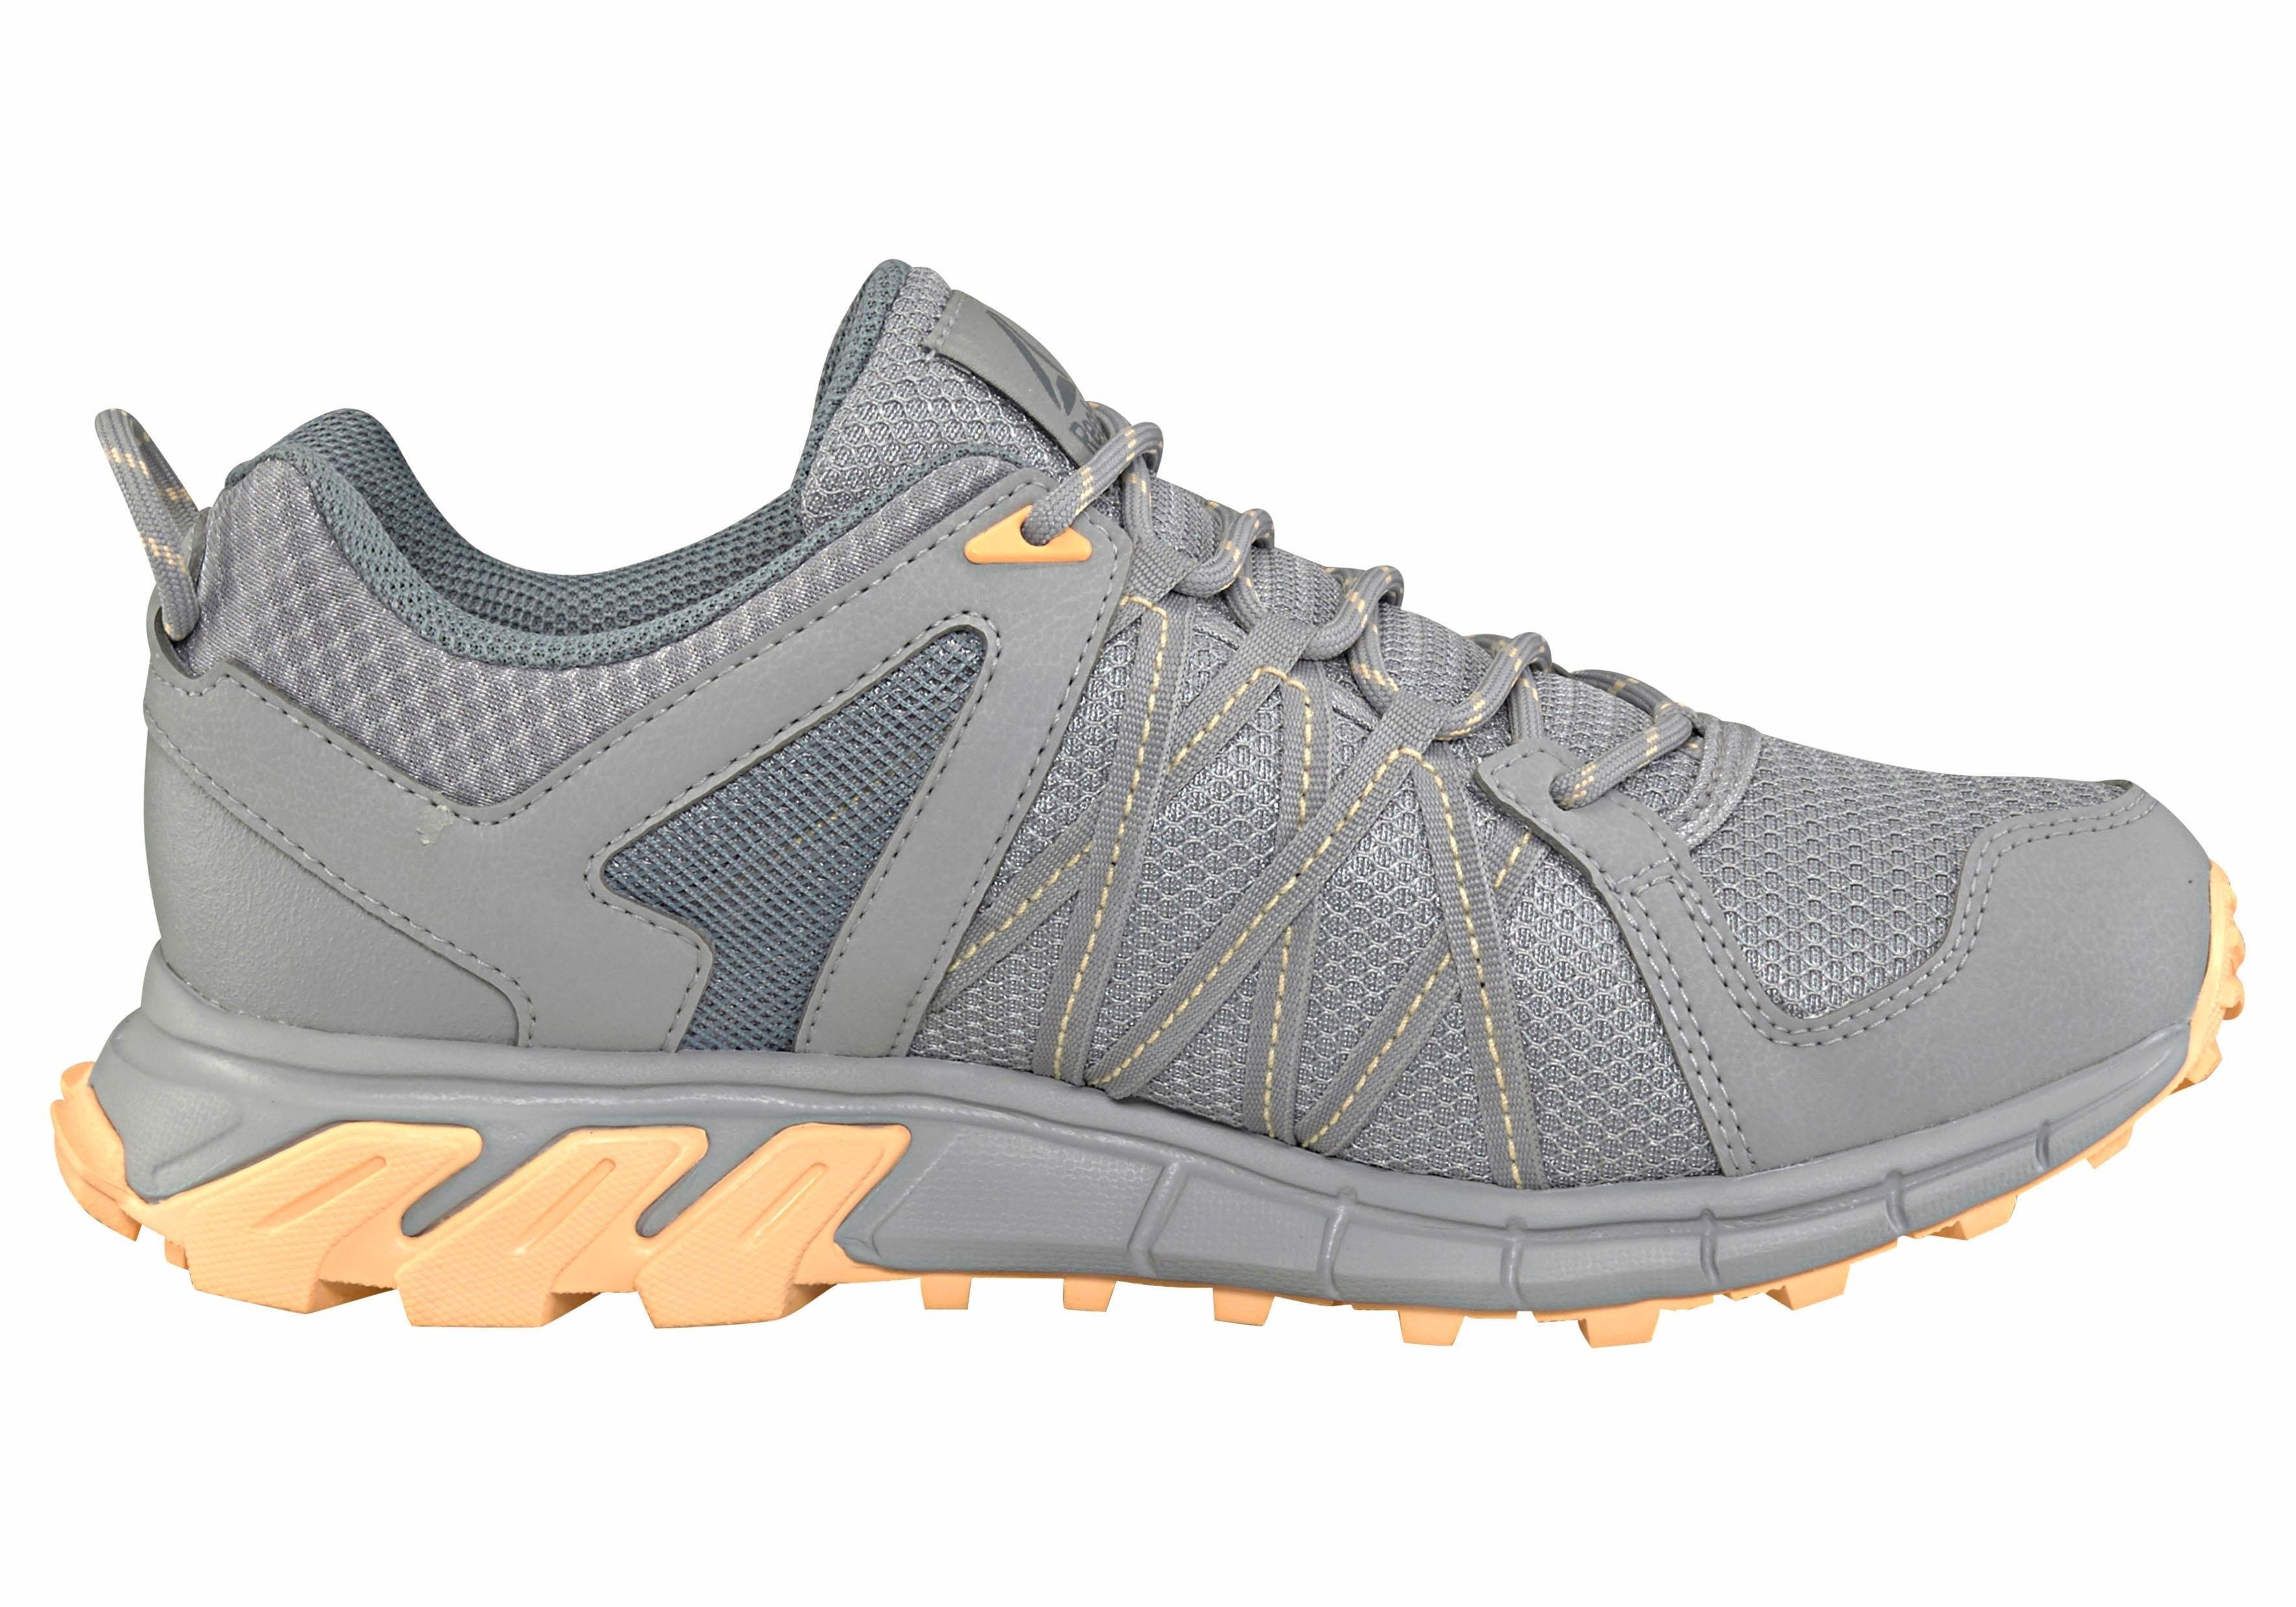 1b0aee69453 REEBOK wandelschoenen »Trailgrip RS 5.0 Gore-Tex« online shoppen   OTTO